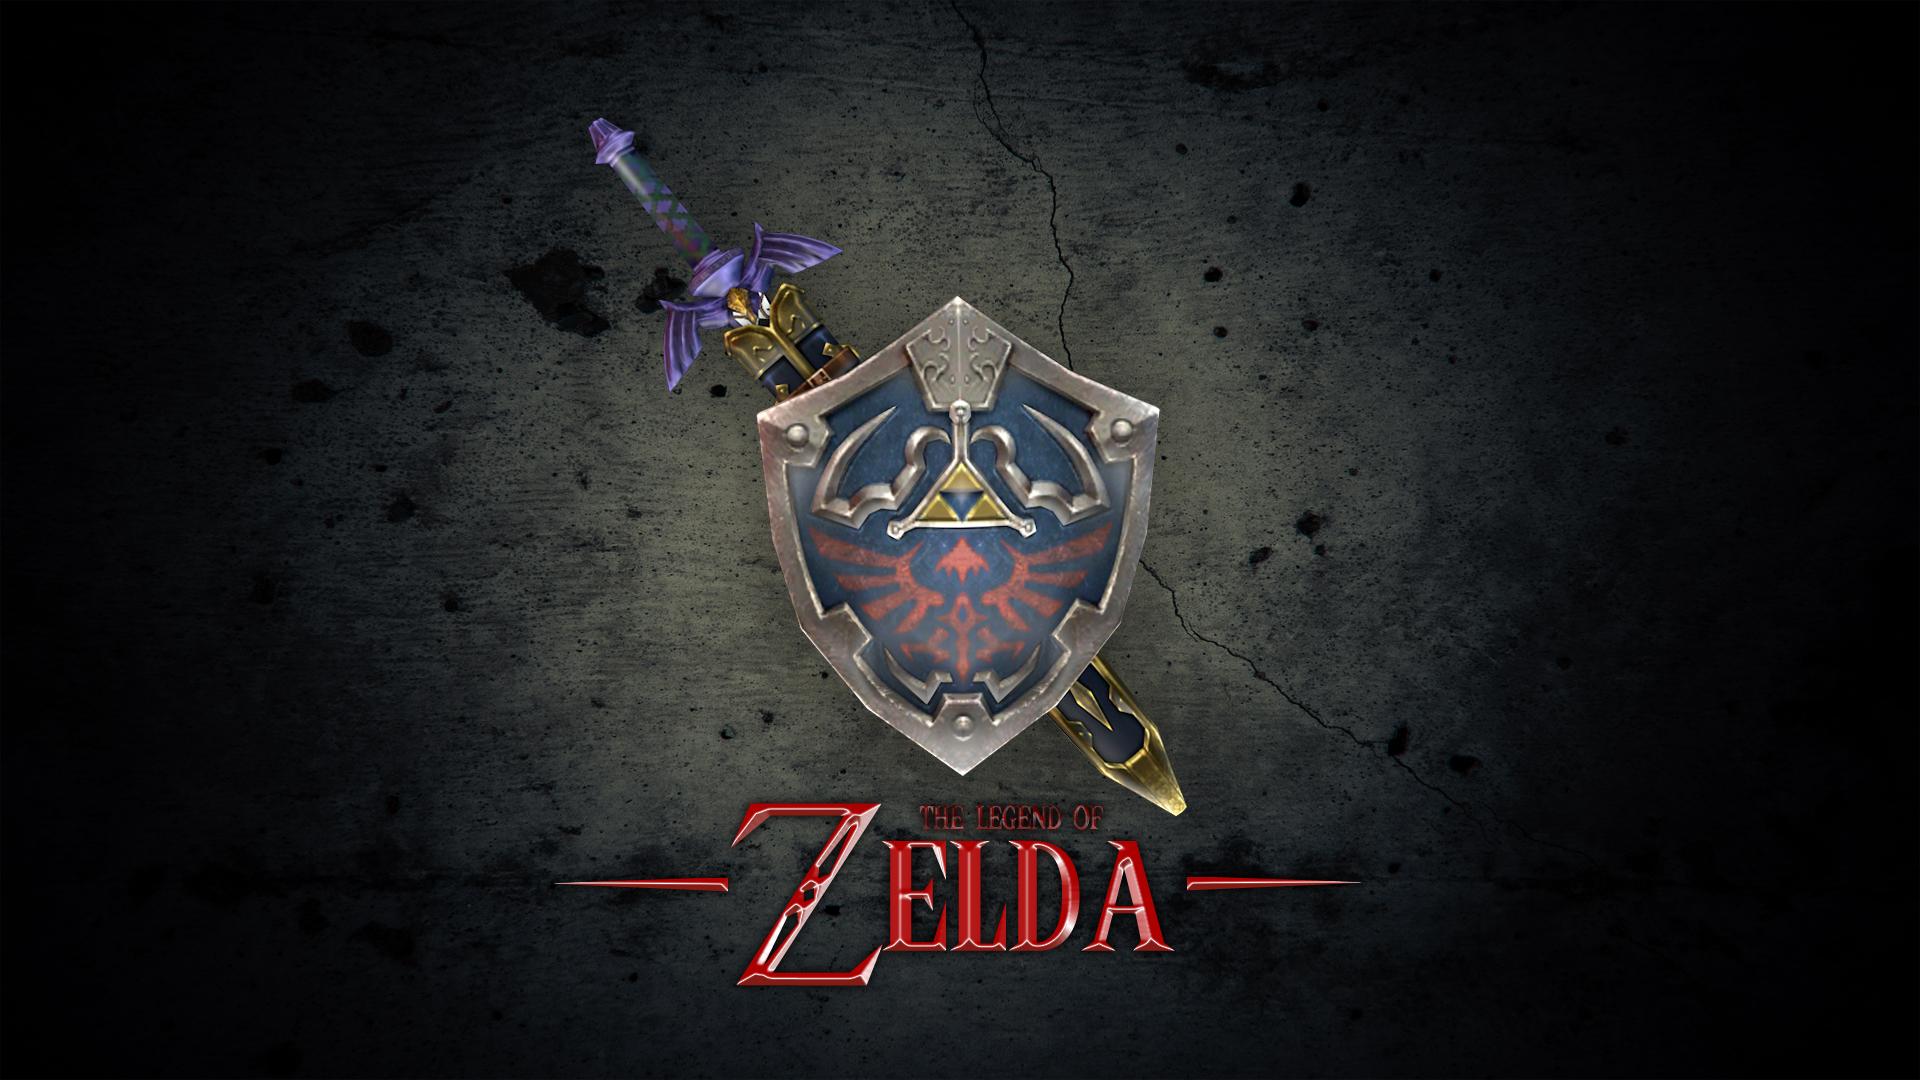 Zelda Wallpaper By TheRisingFX